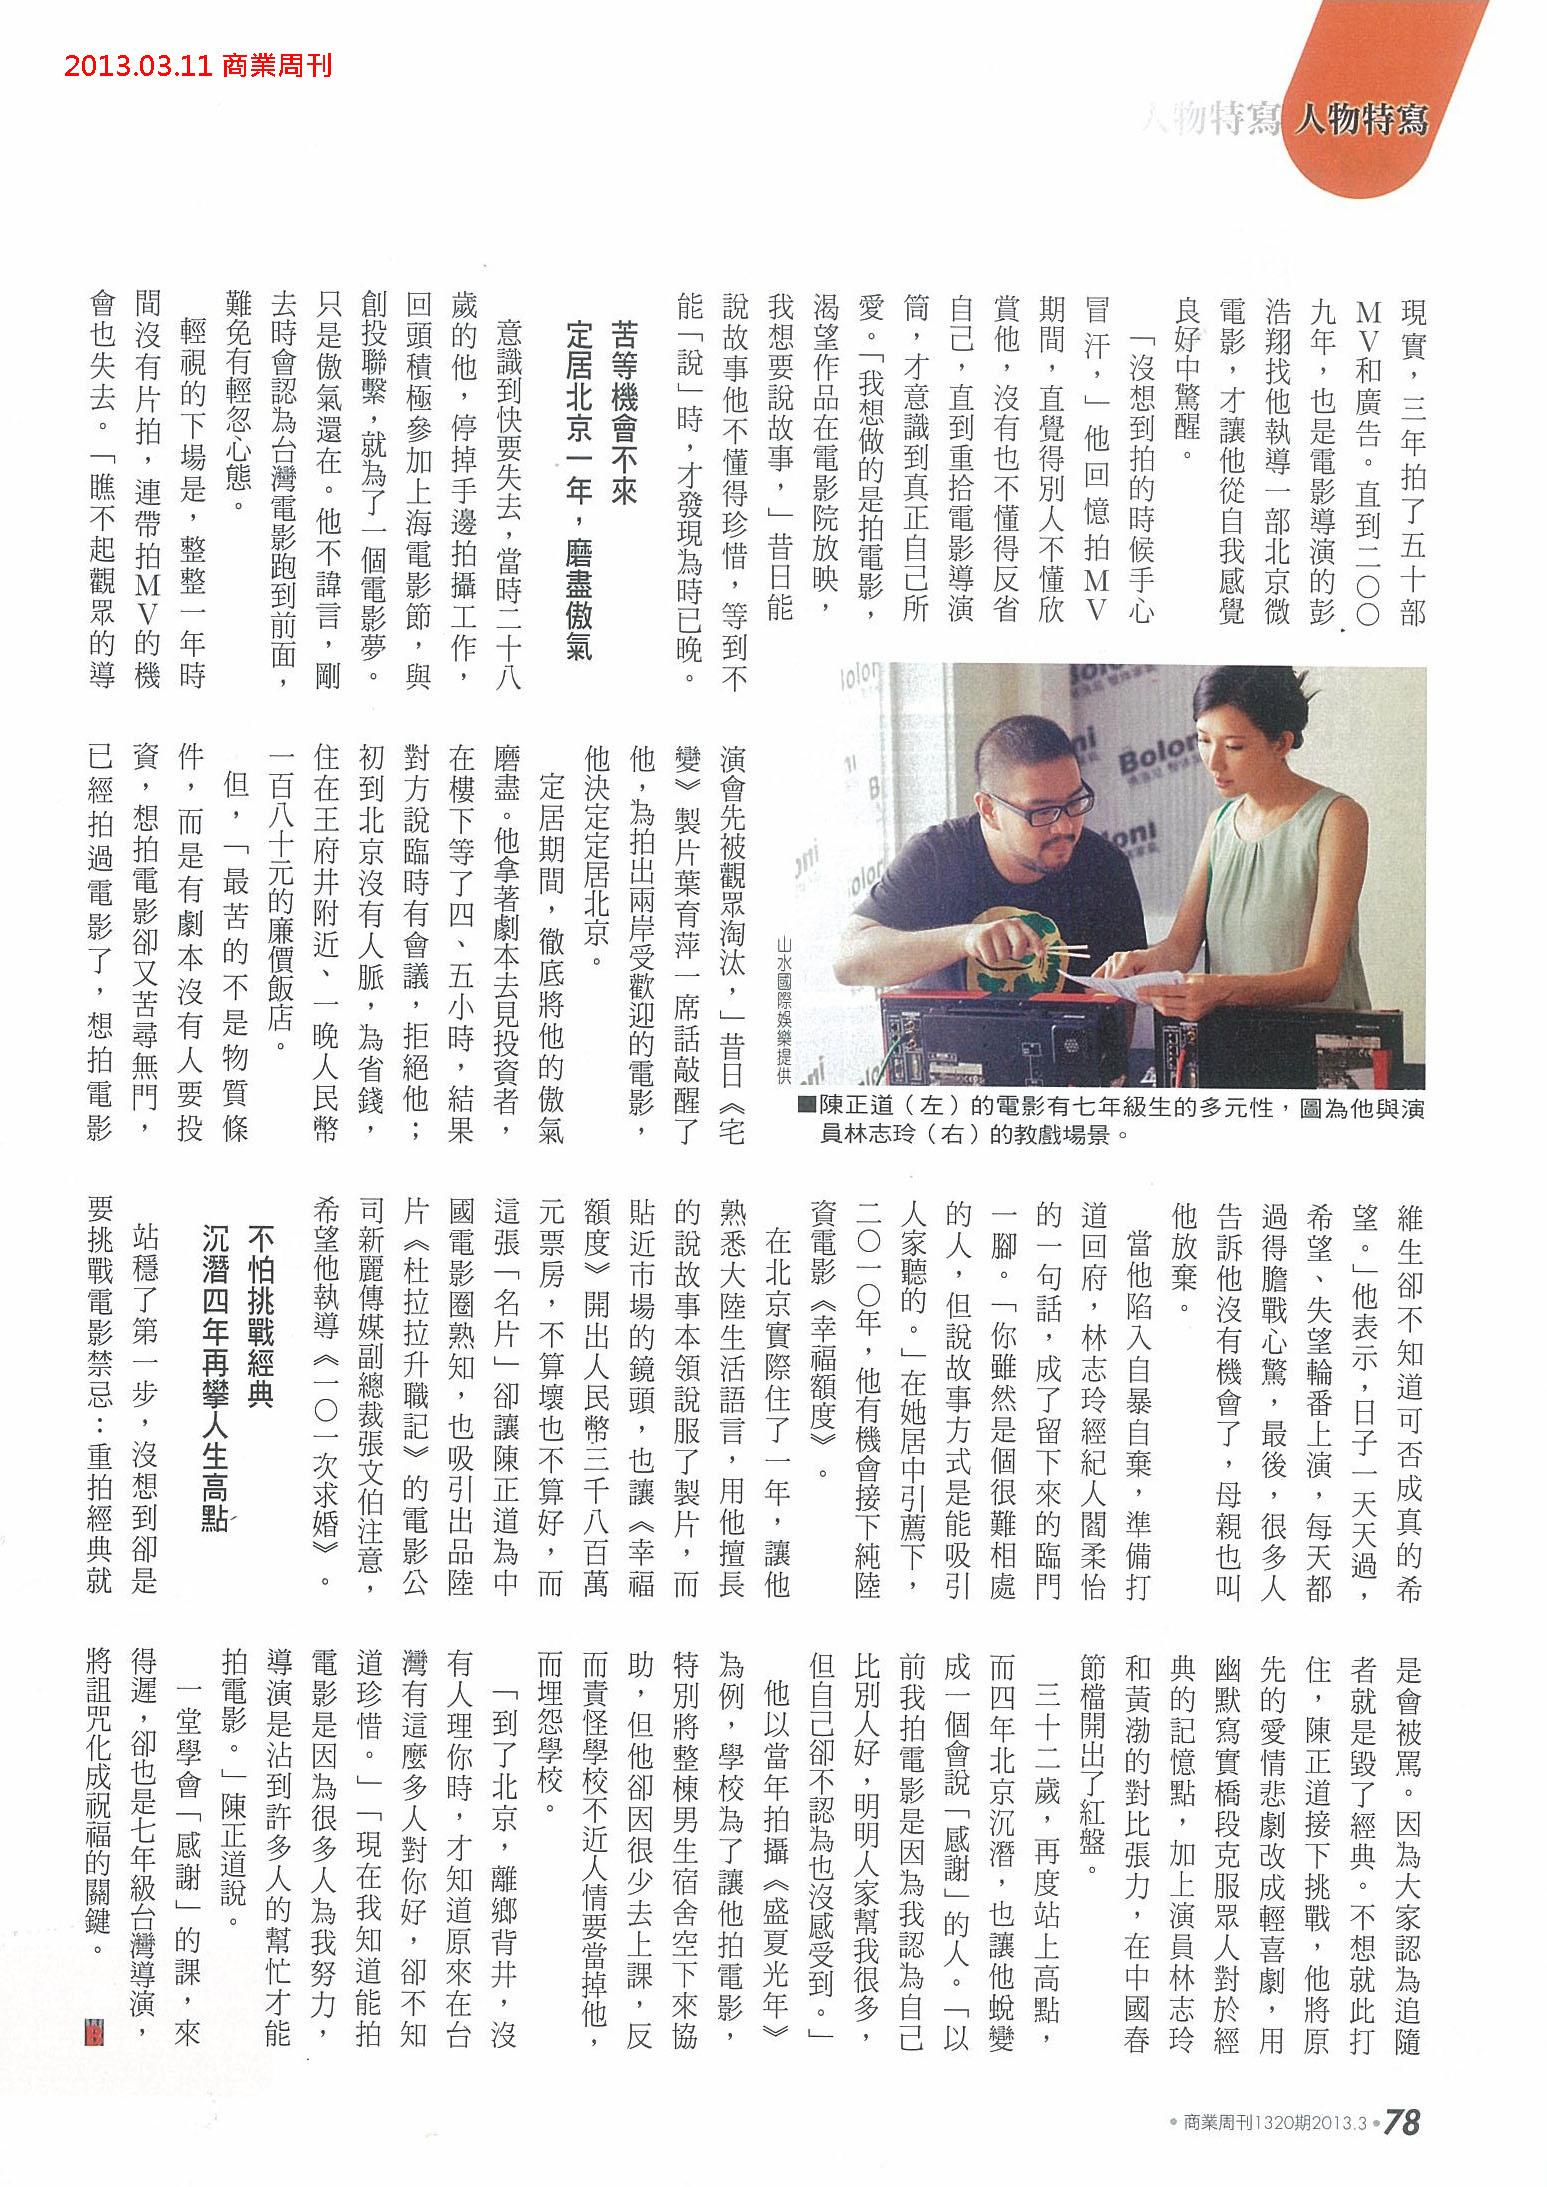 MG露出_2013.03.11_《101次求婚》_商業周刊_導演訪談-2